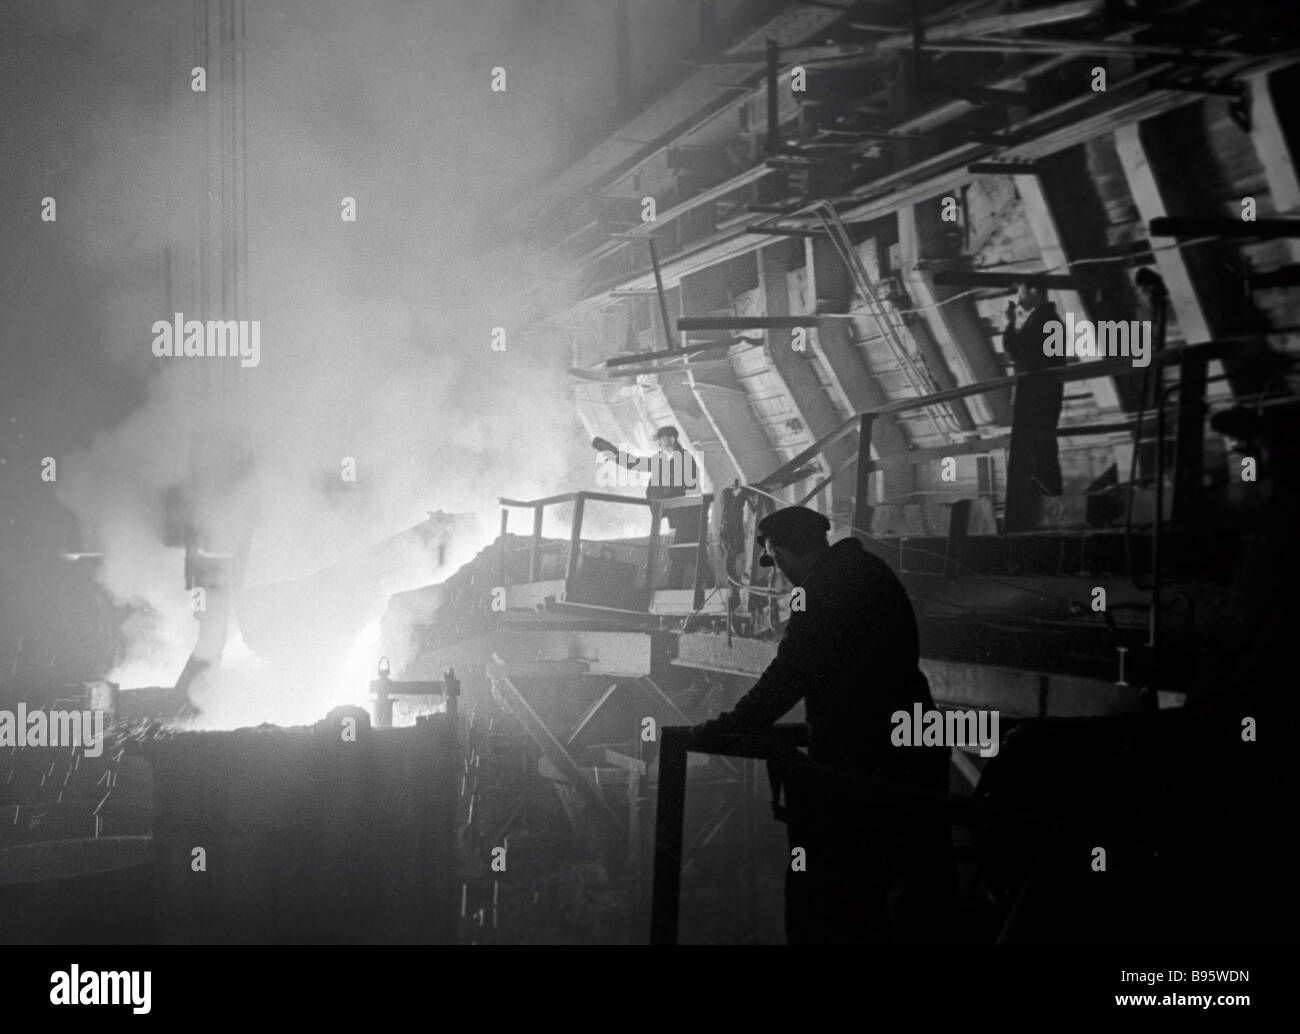 A steelmaker controlling hot metal flow in a blast furnace hearth Stock Photo